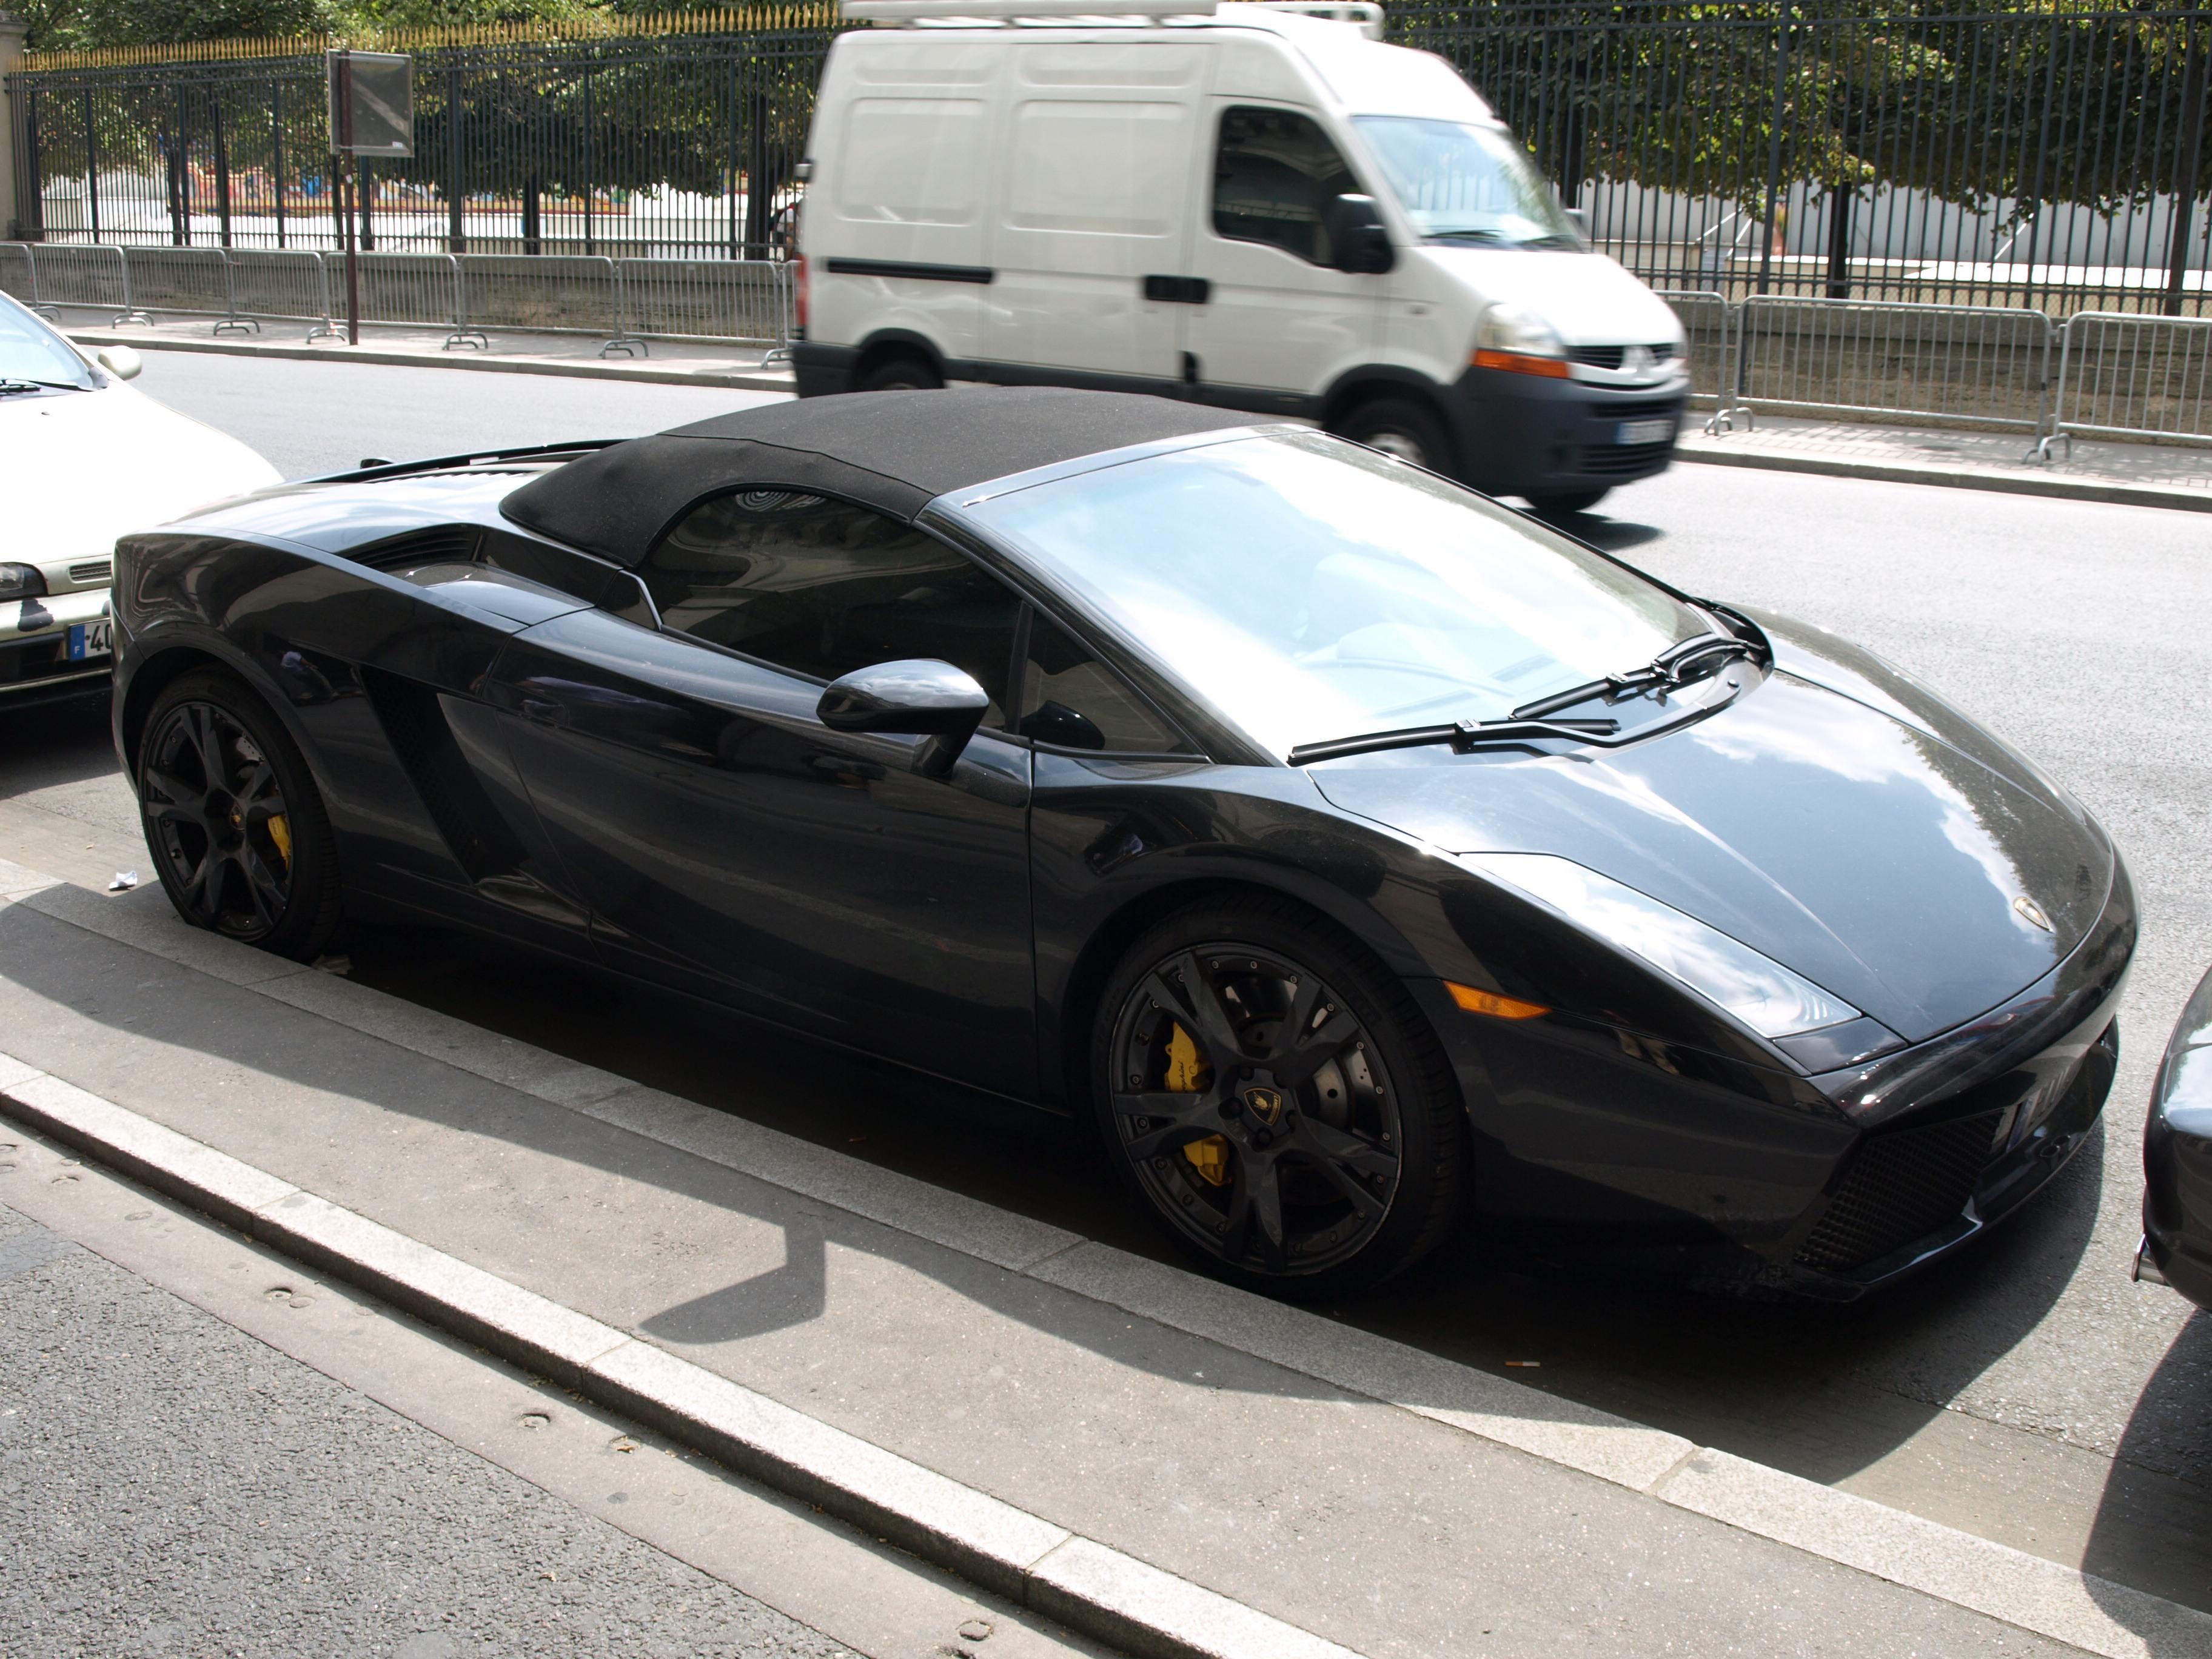 File:Lamborghini Gallardo Spyder (front).JPG